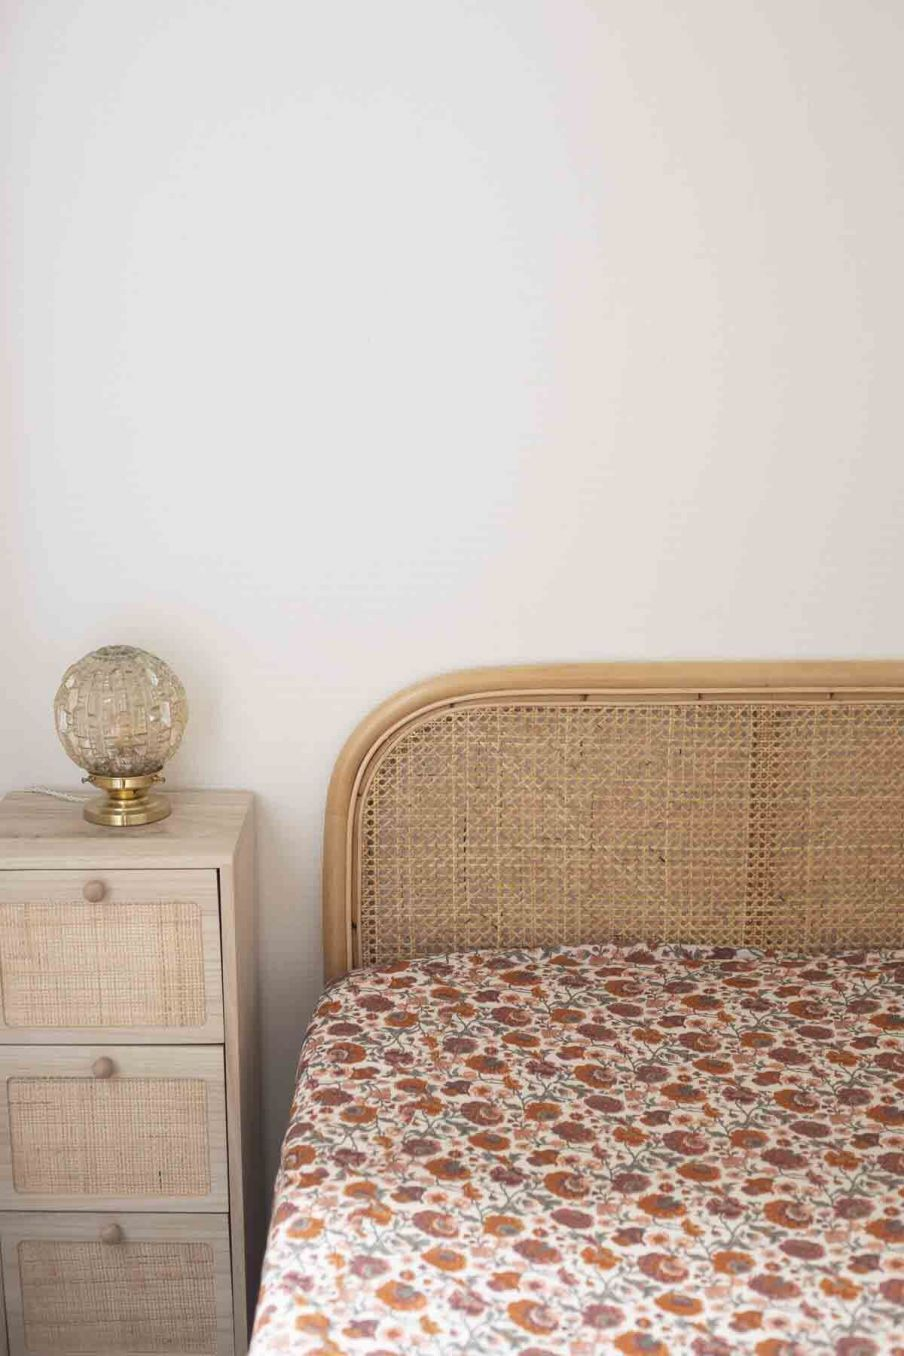 drap-housse maison nicole cream bohemian flowers - louise misha